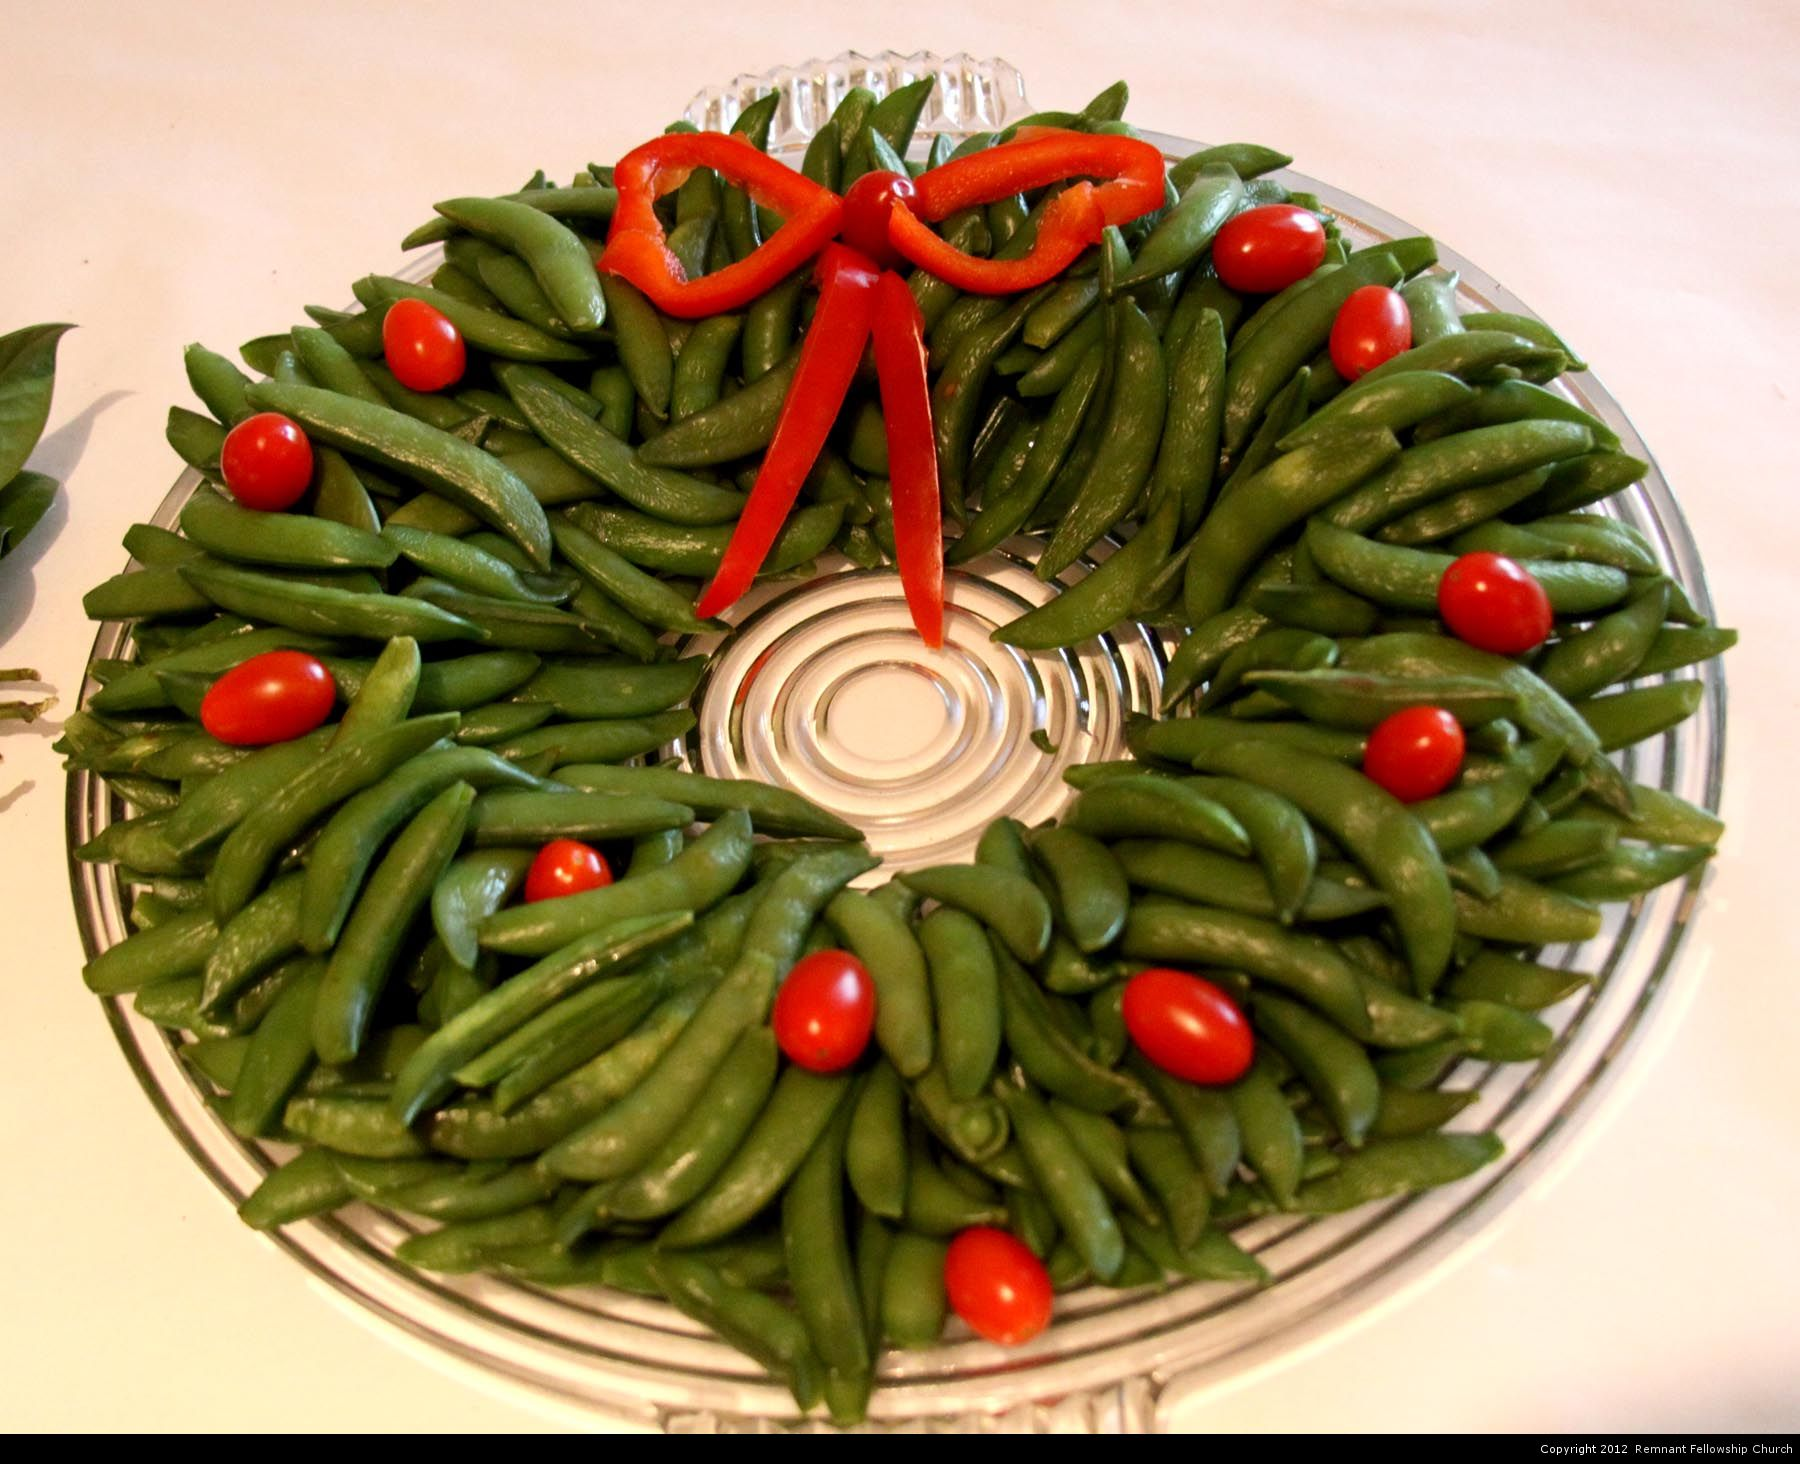 Winter Wedding Reception Food | Snow Pean Wreath and Cherry Tomato Roses